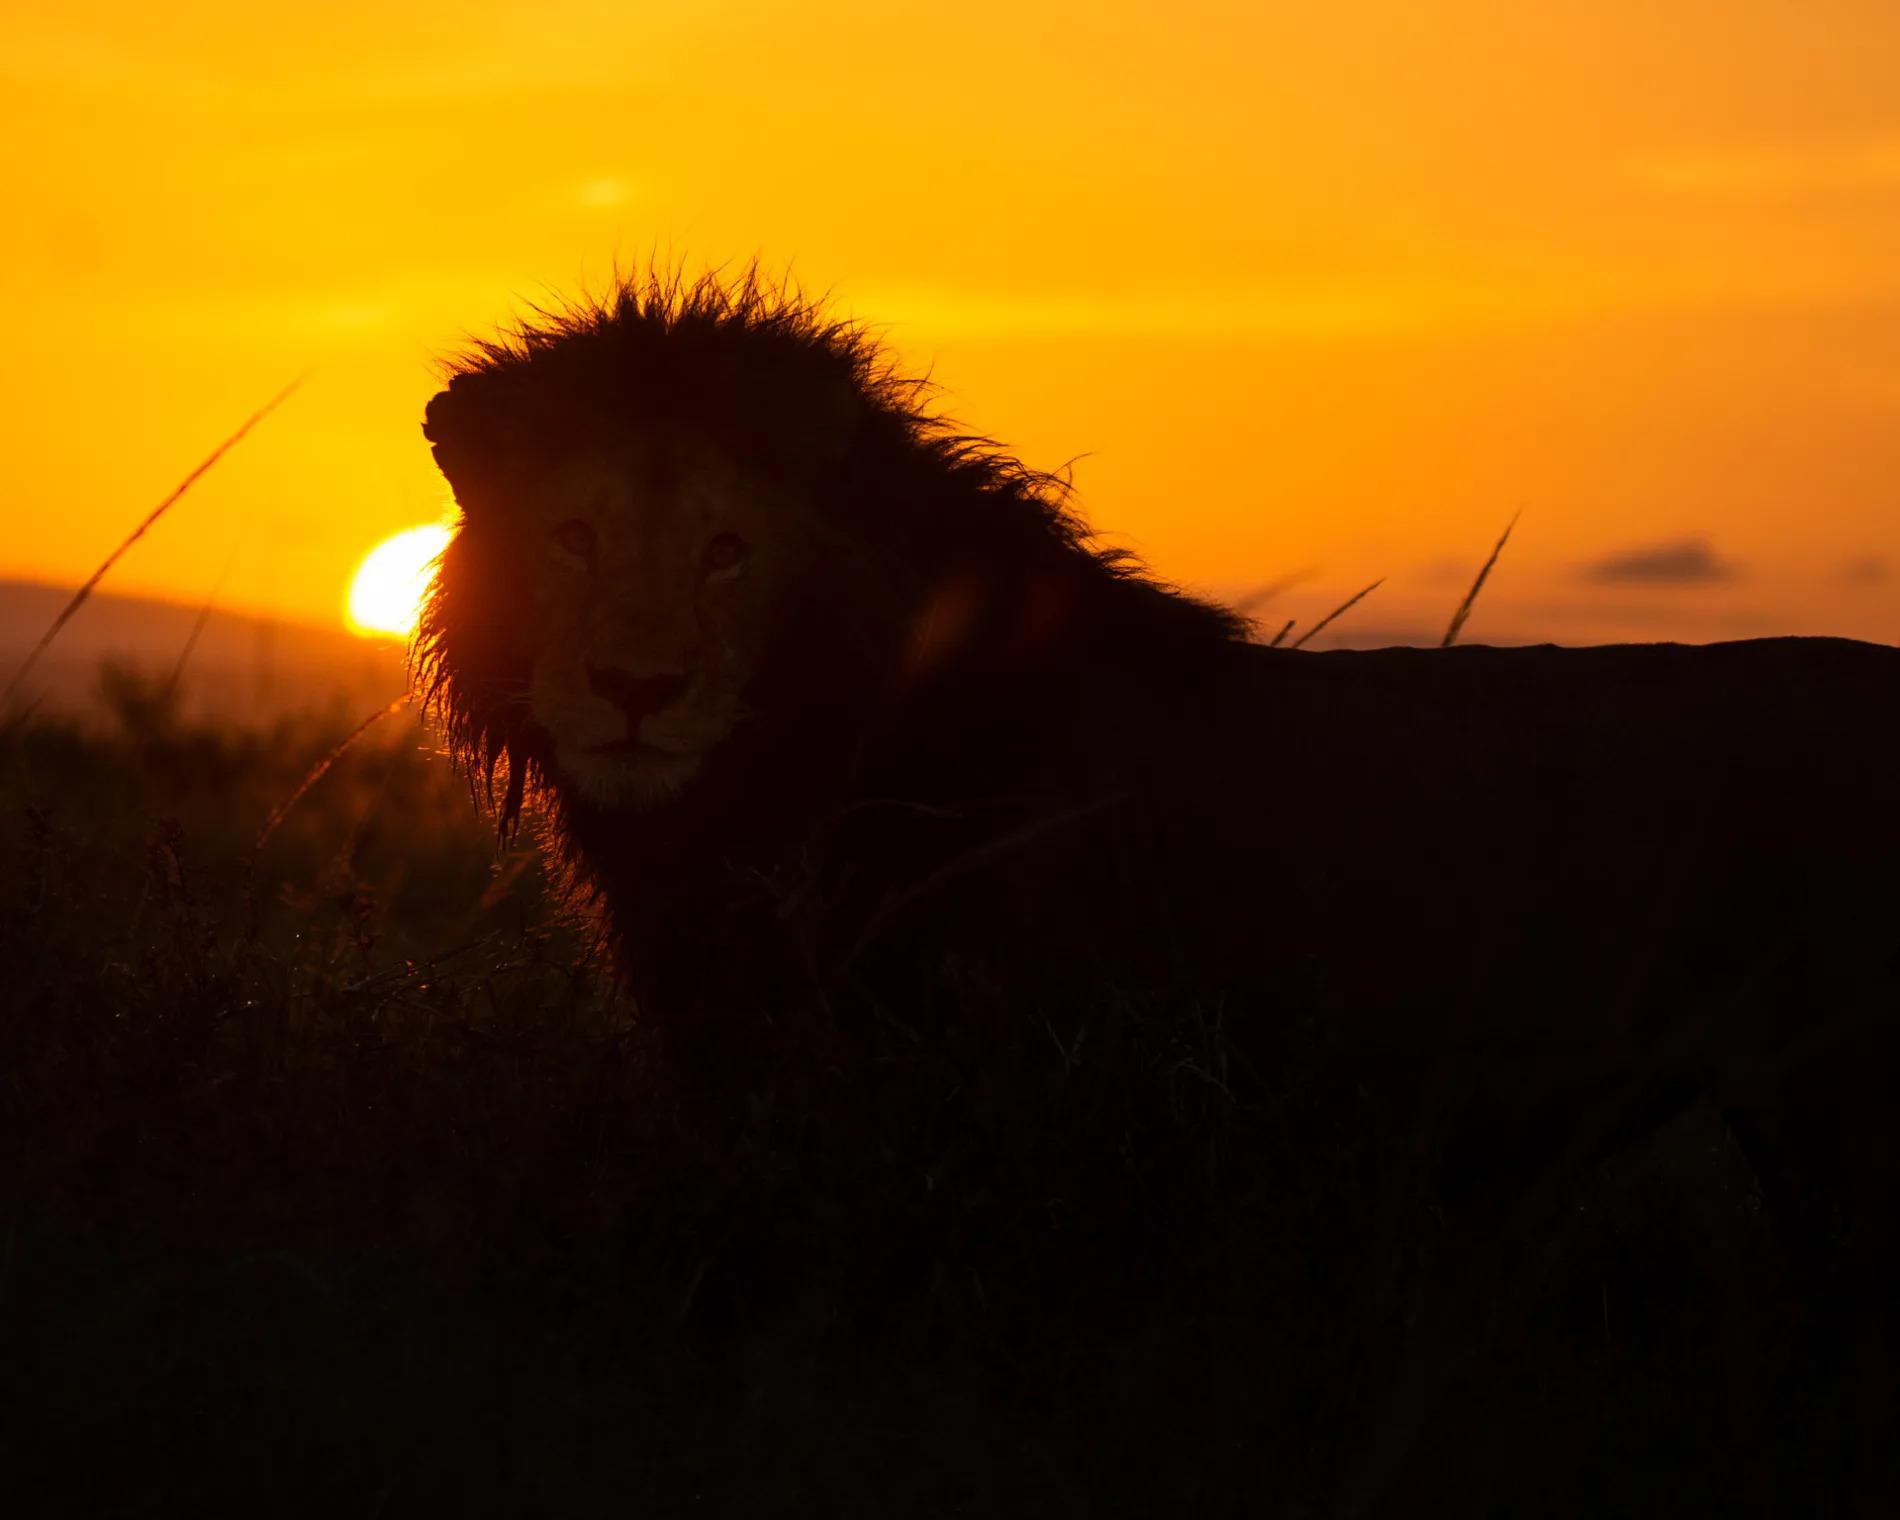 Male Lion in sunrise